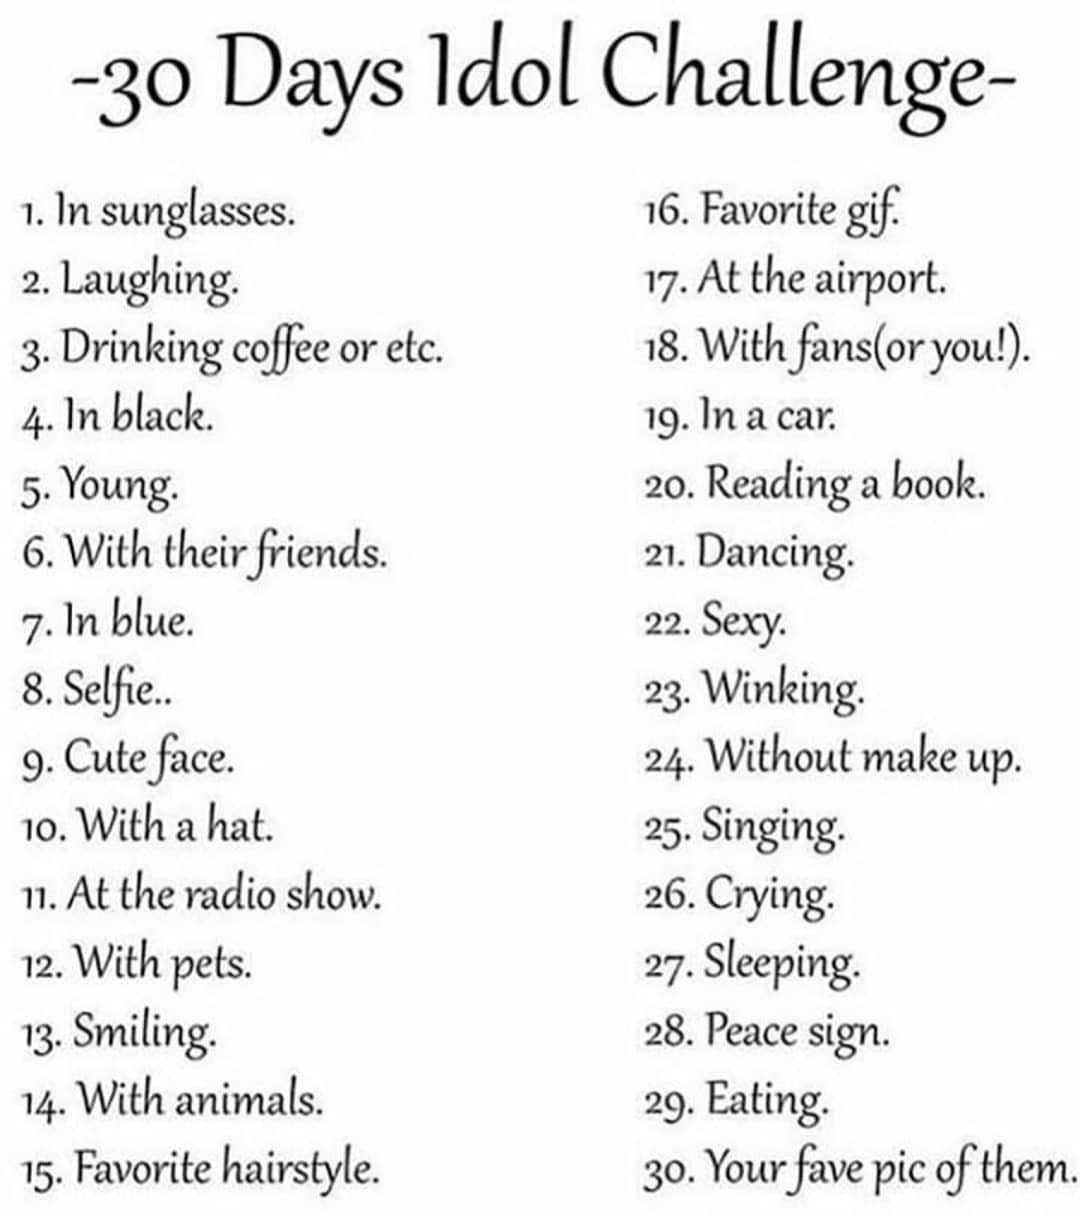 30 Days Idol Challenge Sebastian Stan 30 Day Music Challenge 30 Days Photo Challenge Music Challenge